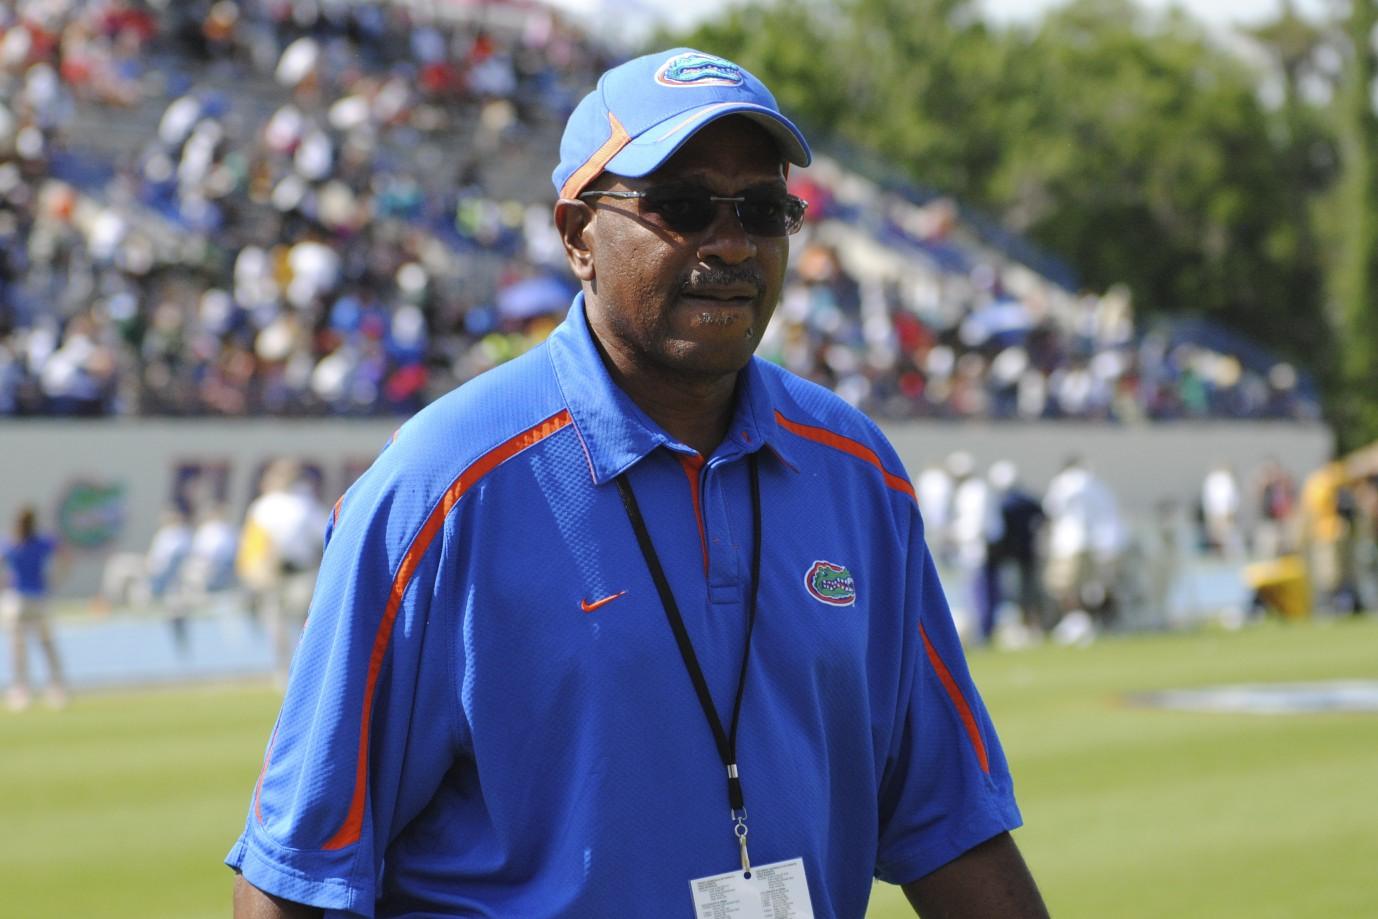 Florida head coach Mike Holloway